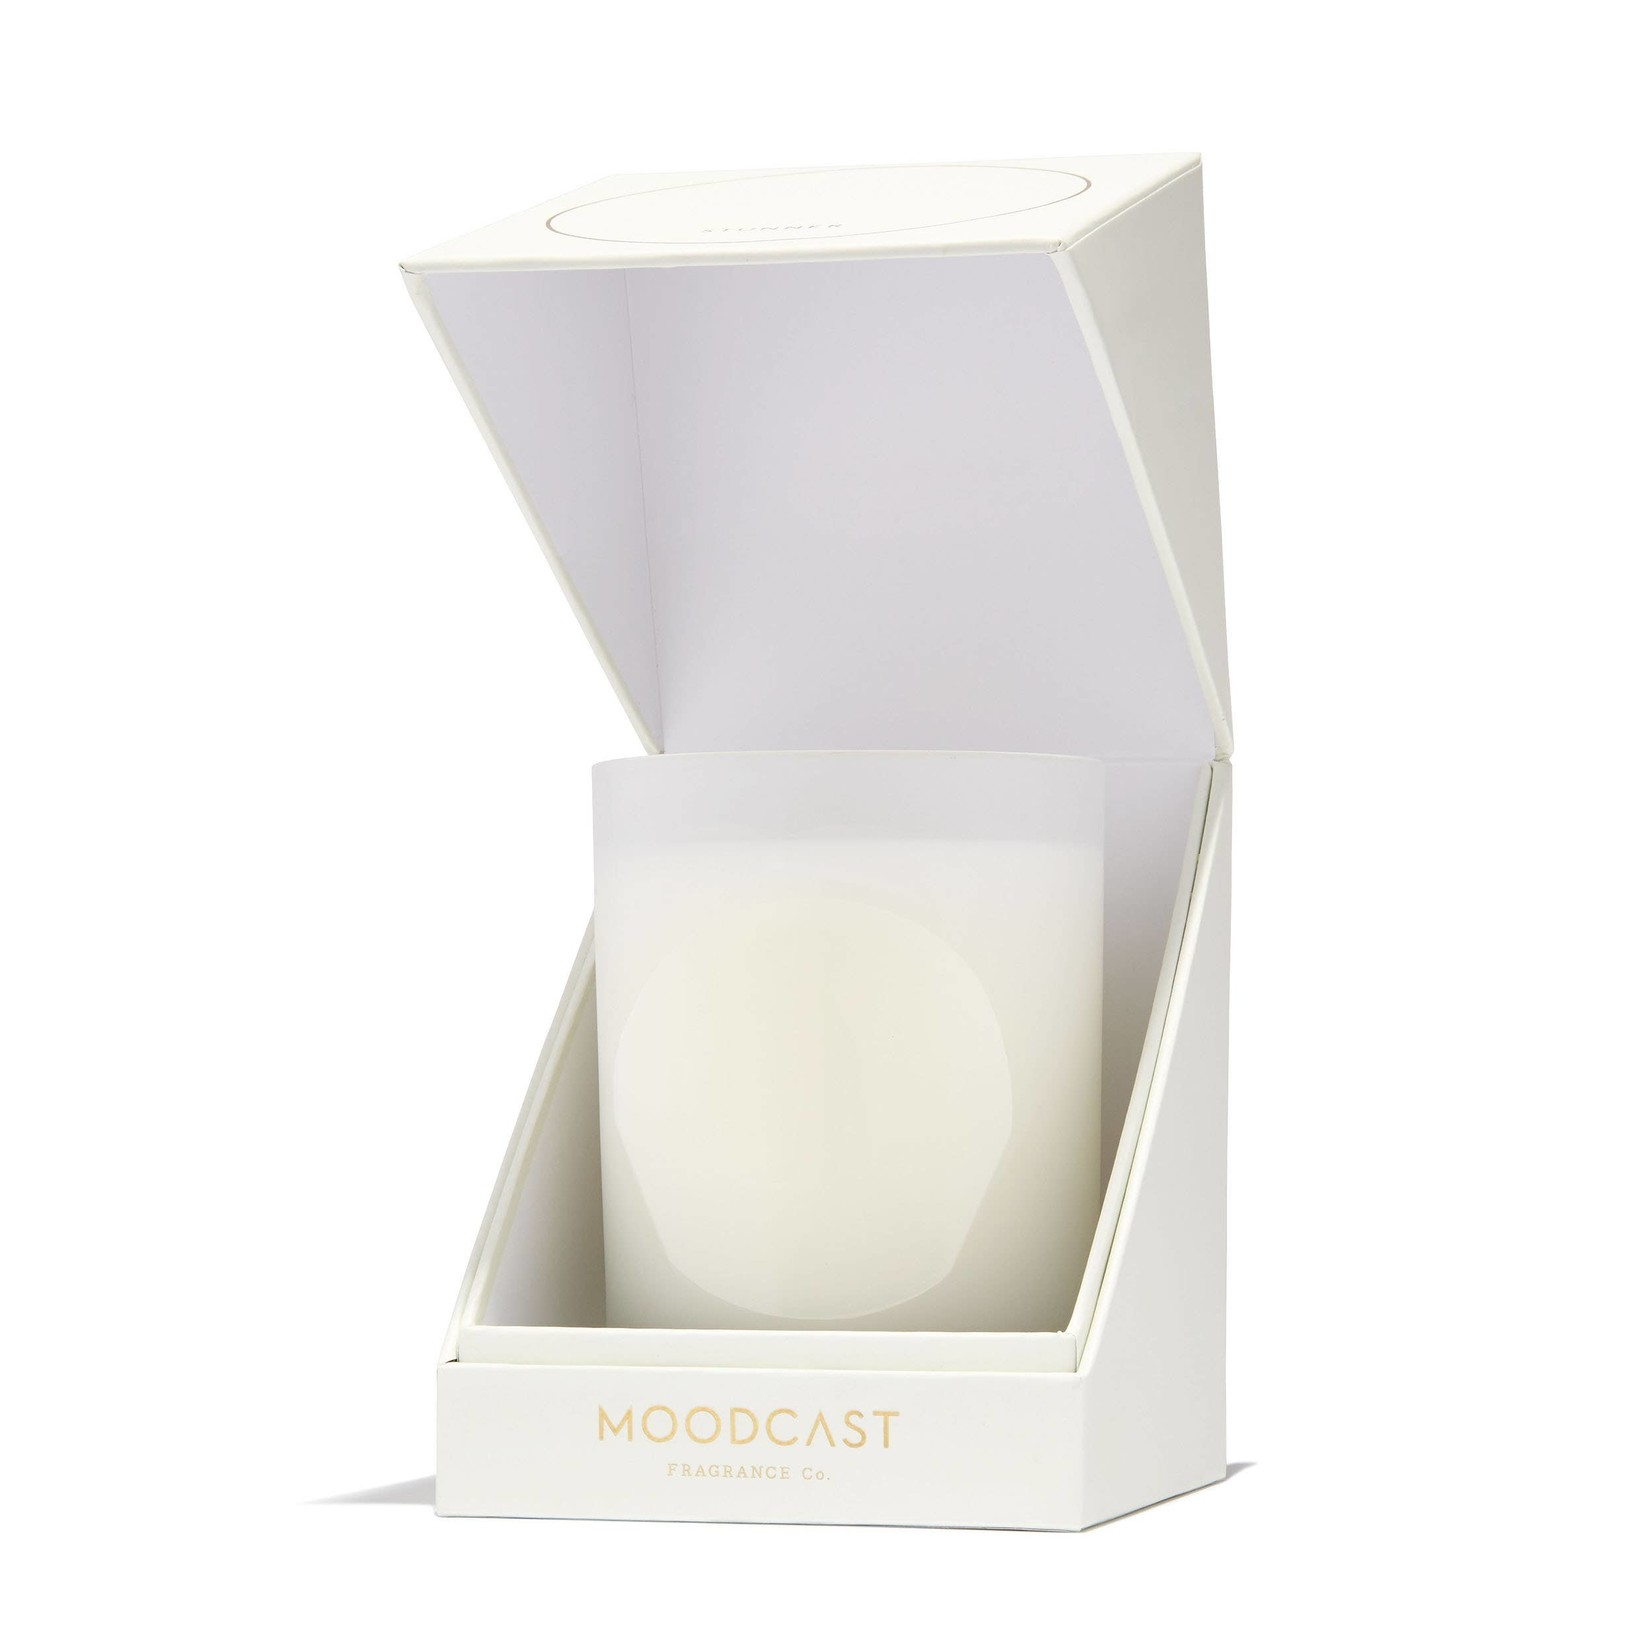 Moodcast Fragrance Co. Moodcast Candles